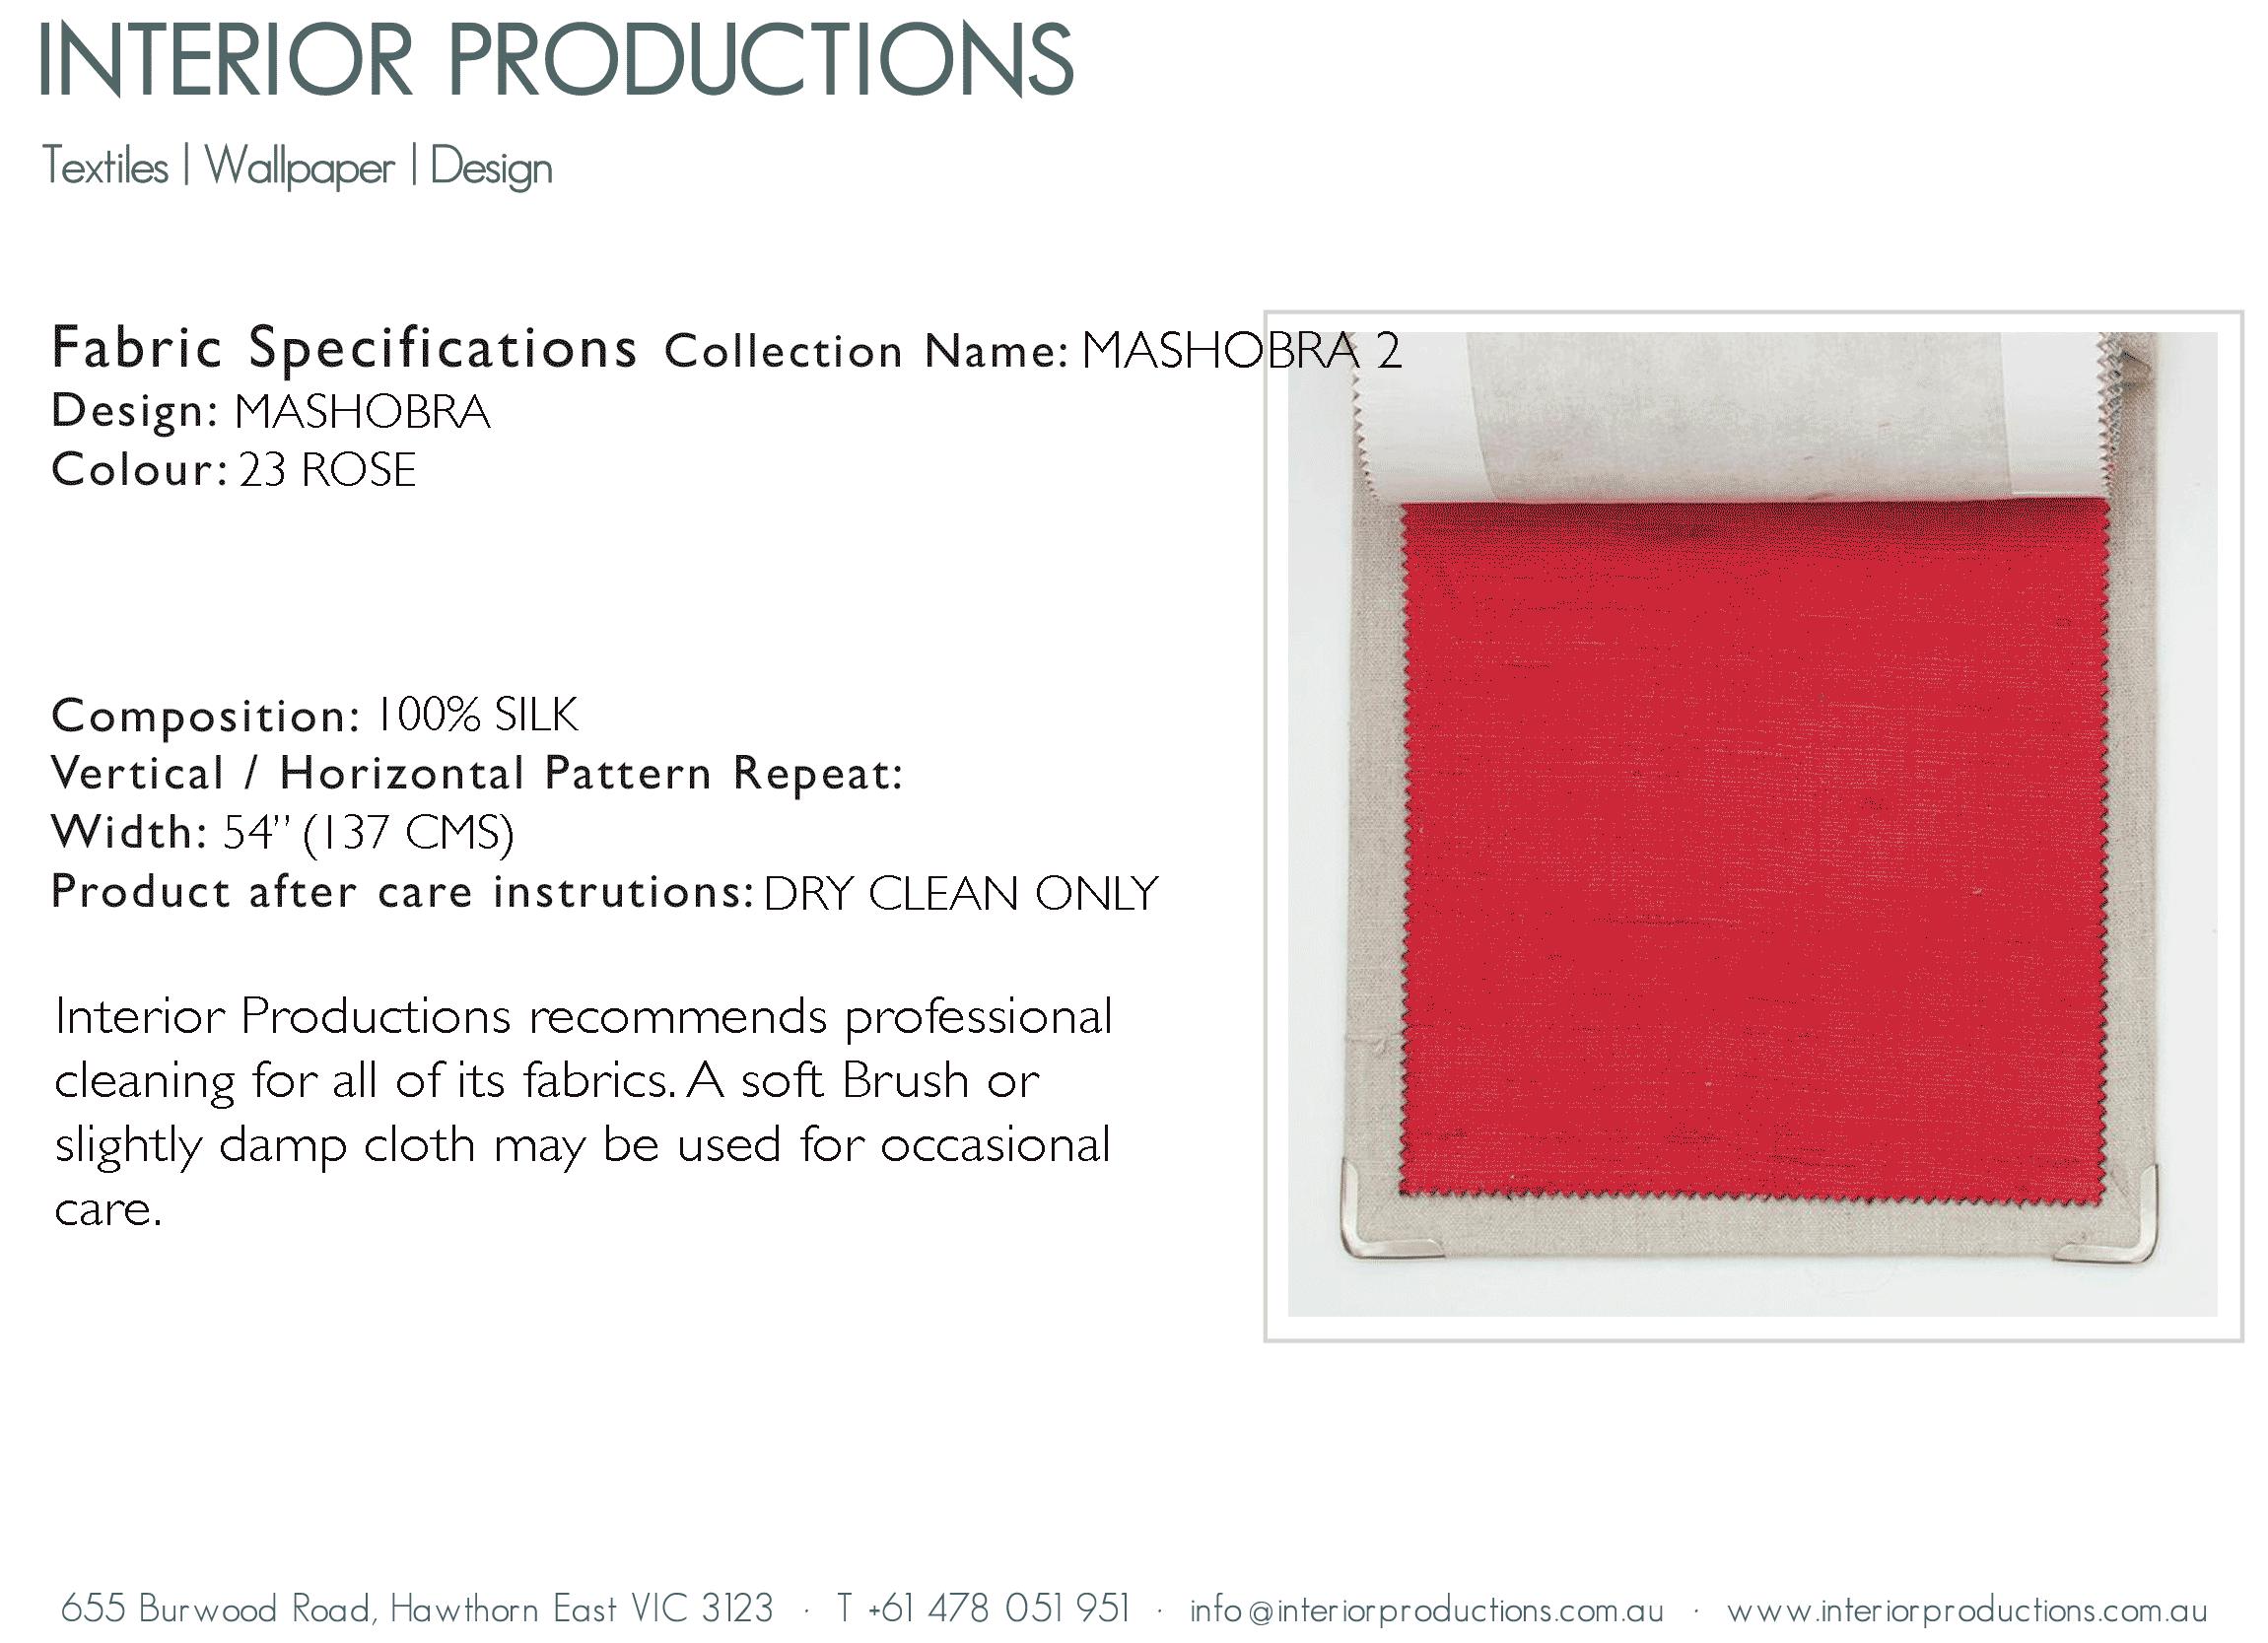 interior_productions_MASHOBRA---23-ROSE